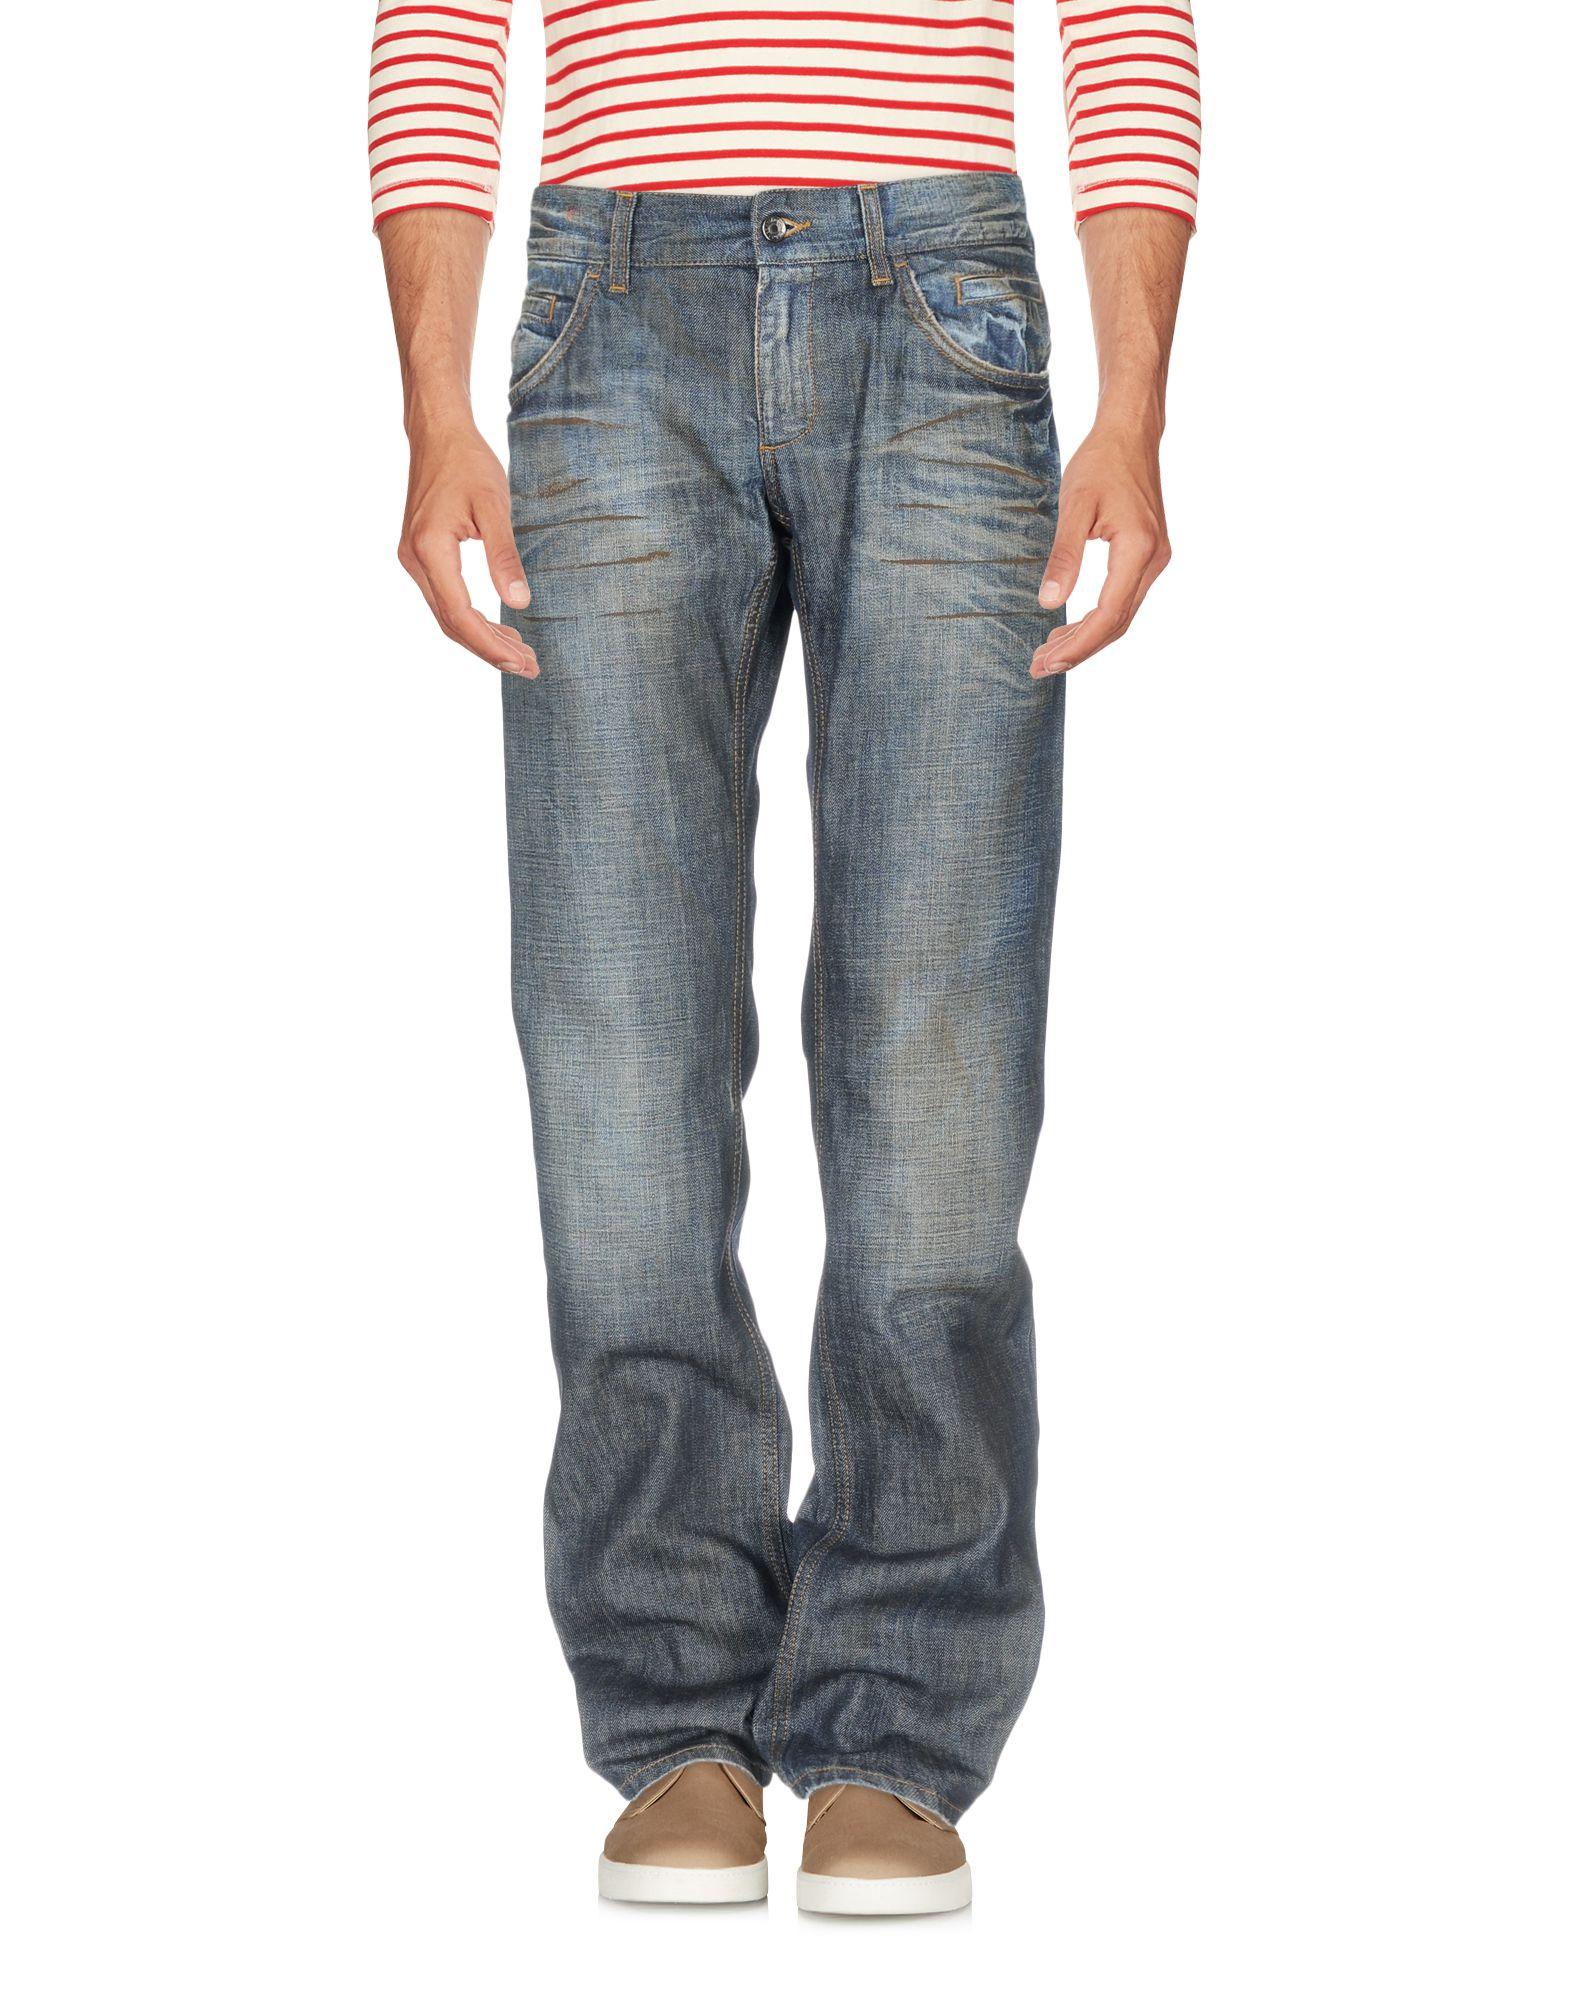 DOLCE & GABBANA Herren Jeanshose Farbe Blau Größe 2